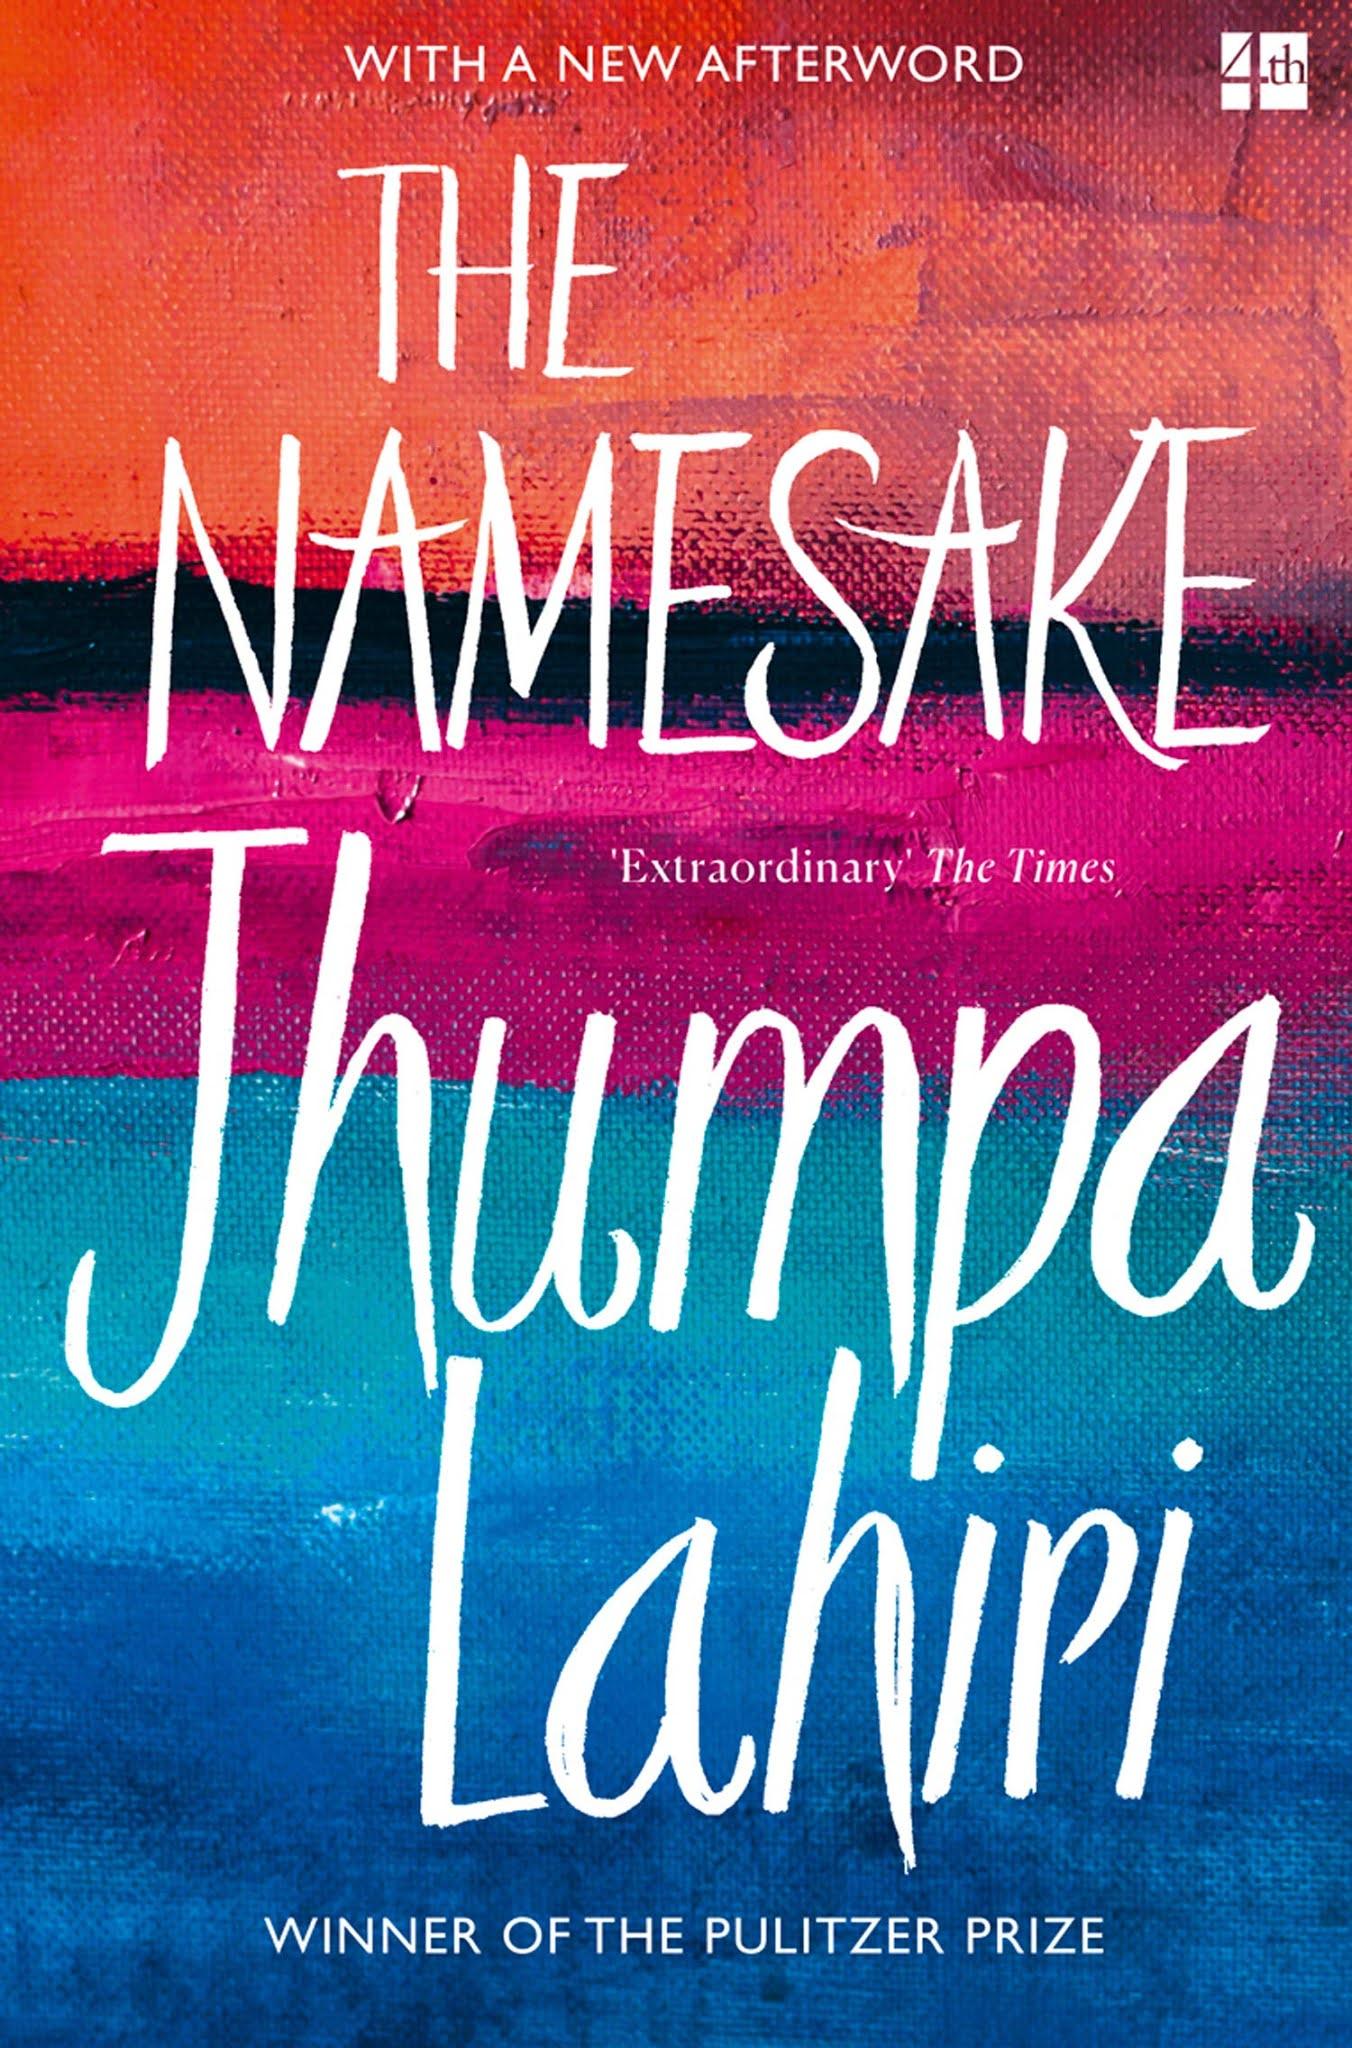 The Namesake by Jhumpa Lahiri   PDF Free Download